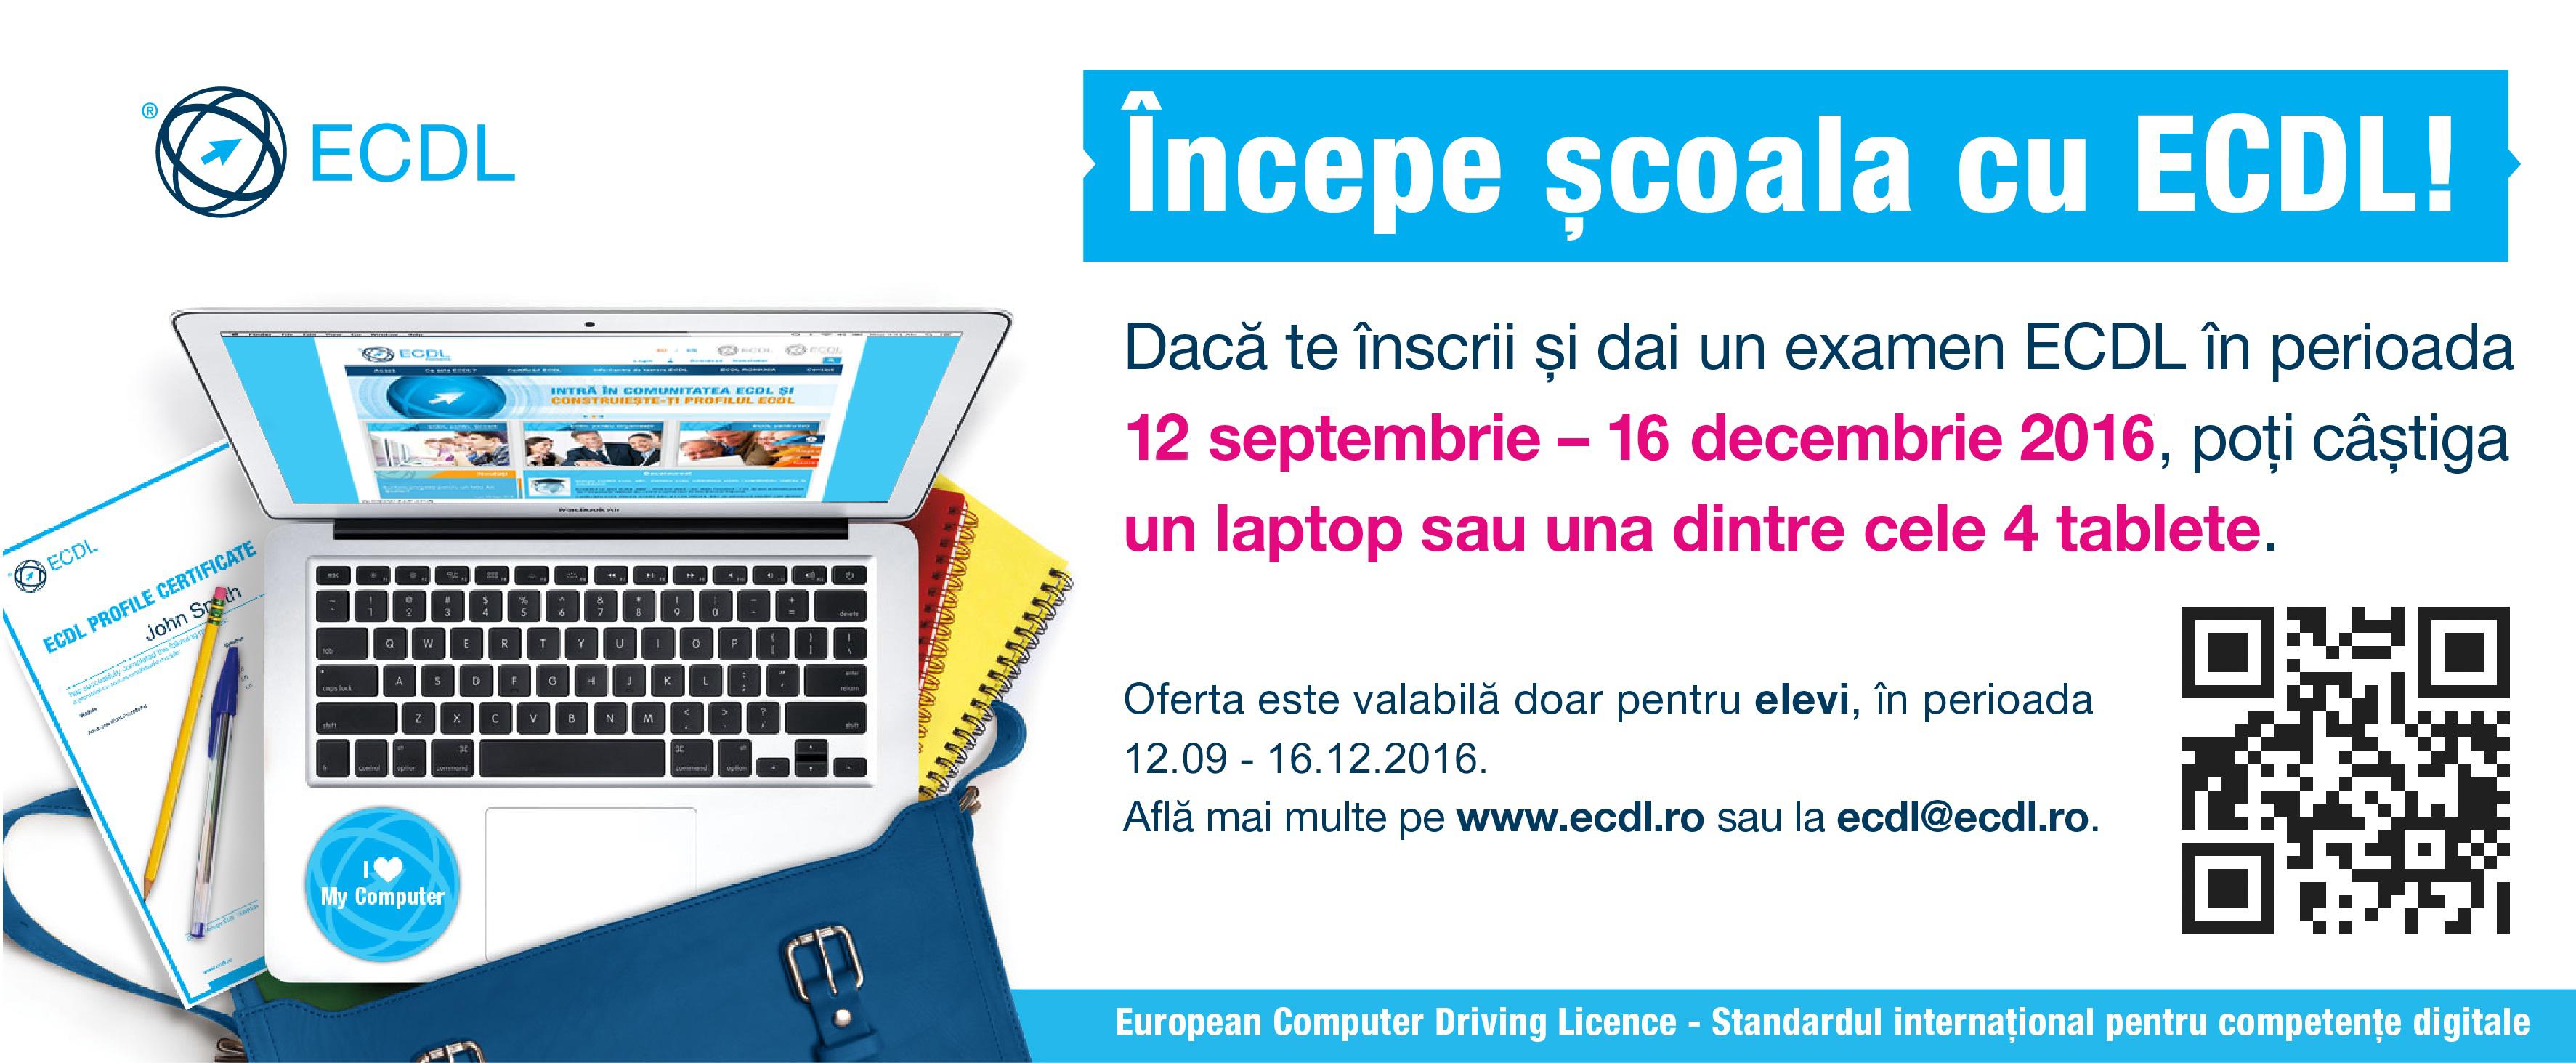 ECDL_Scoala_WebBanner_851x351px.png